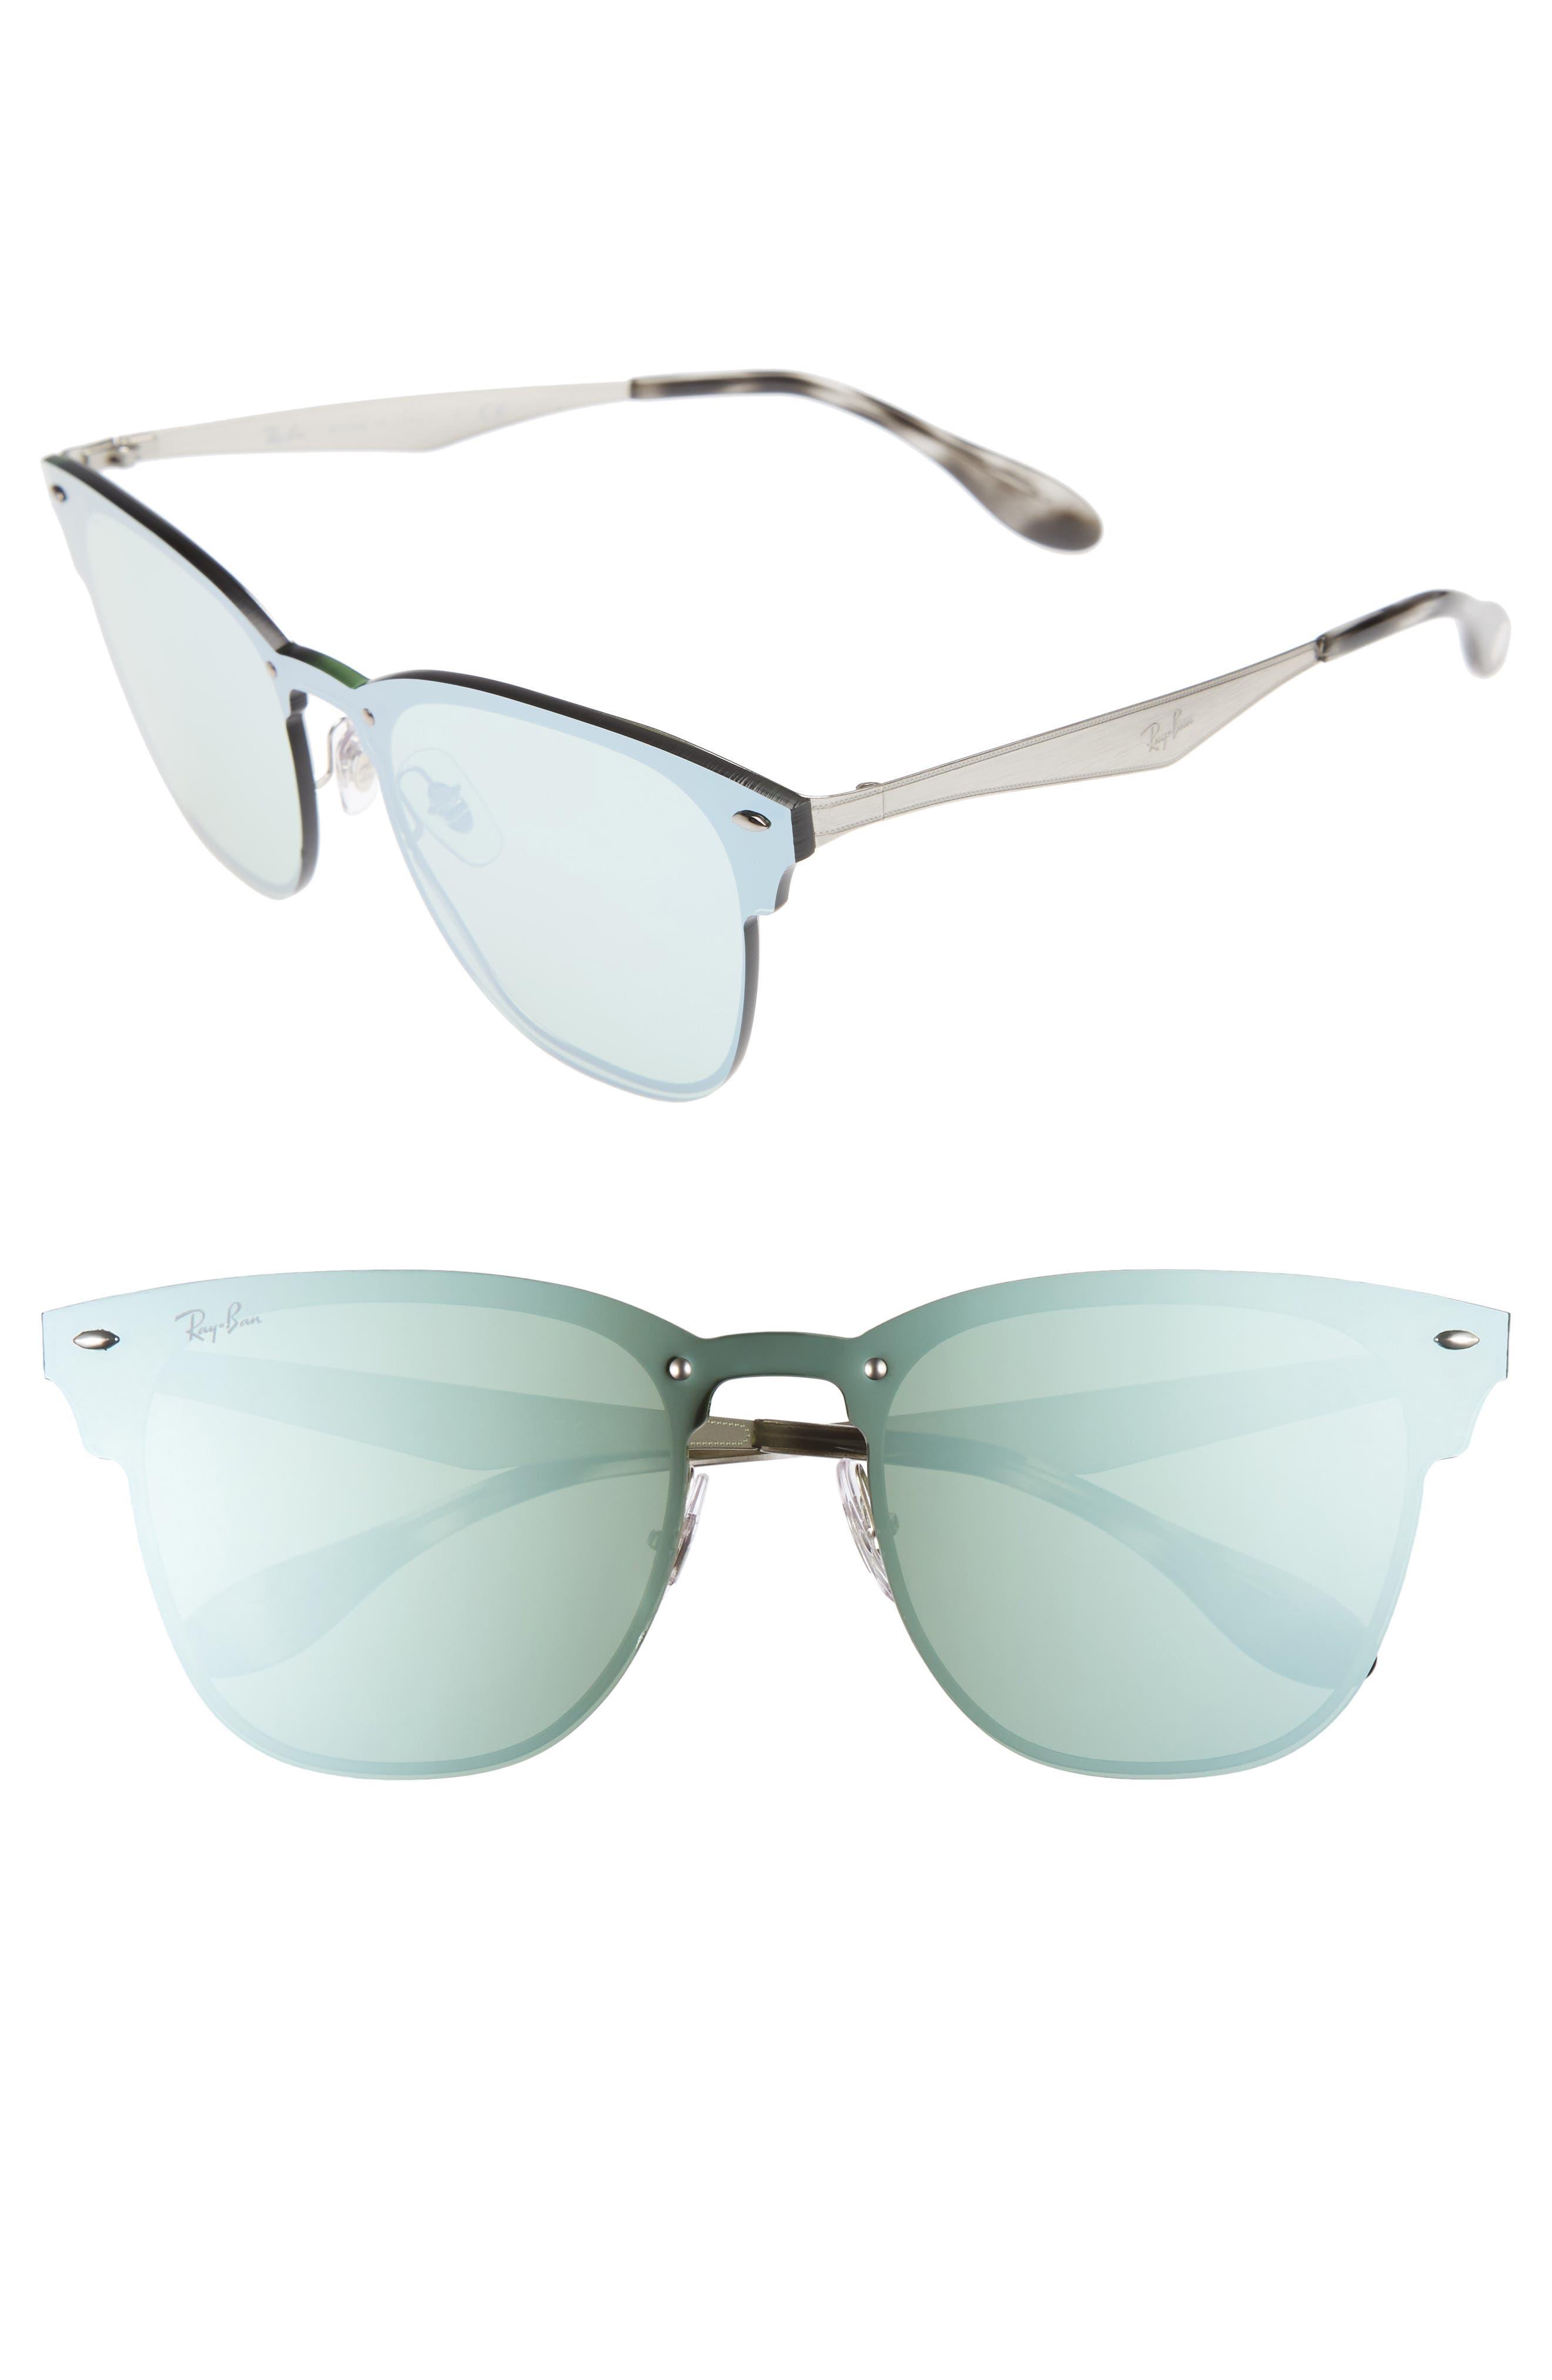 Main Image - Ray-Ban Wayfarer 42mm Sunglasses